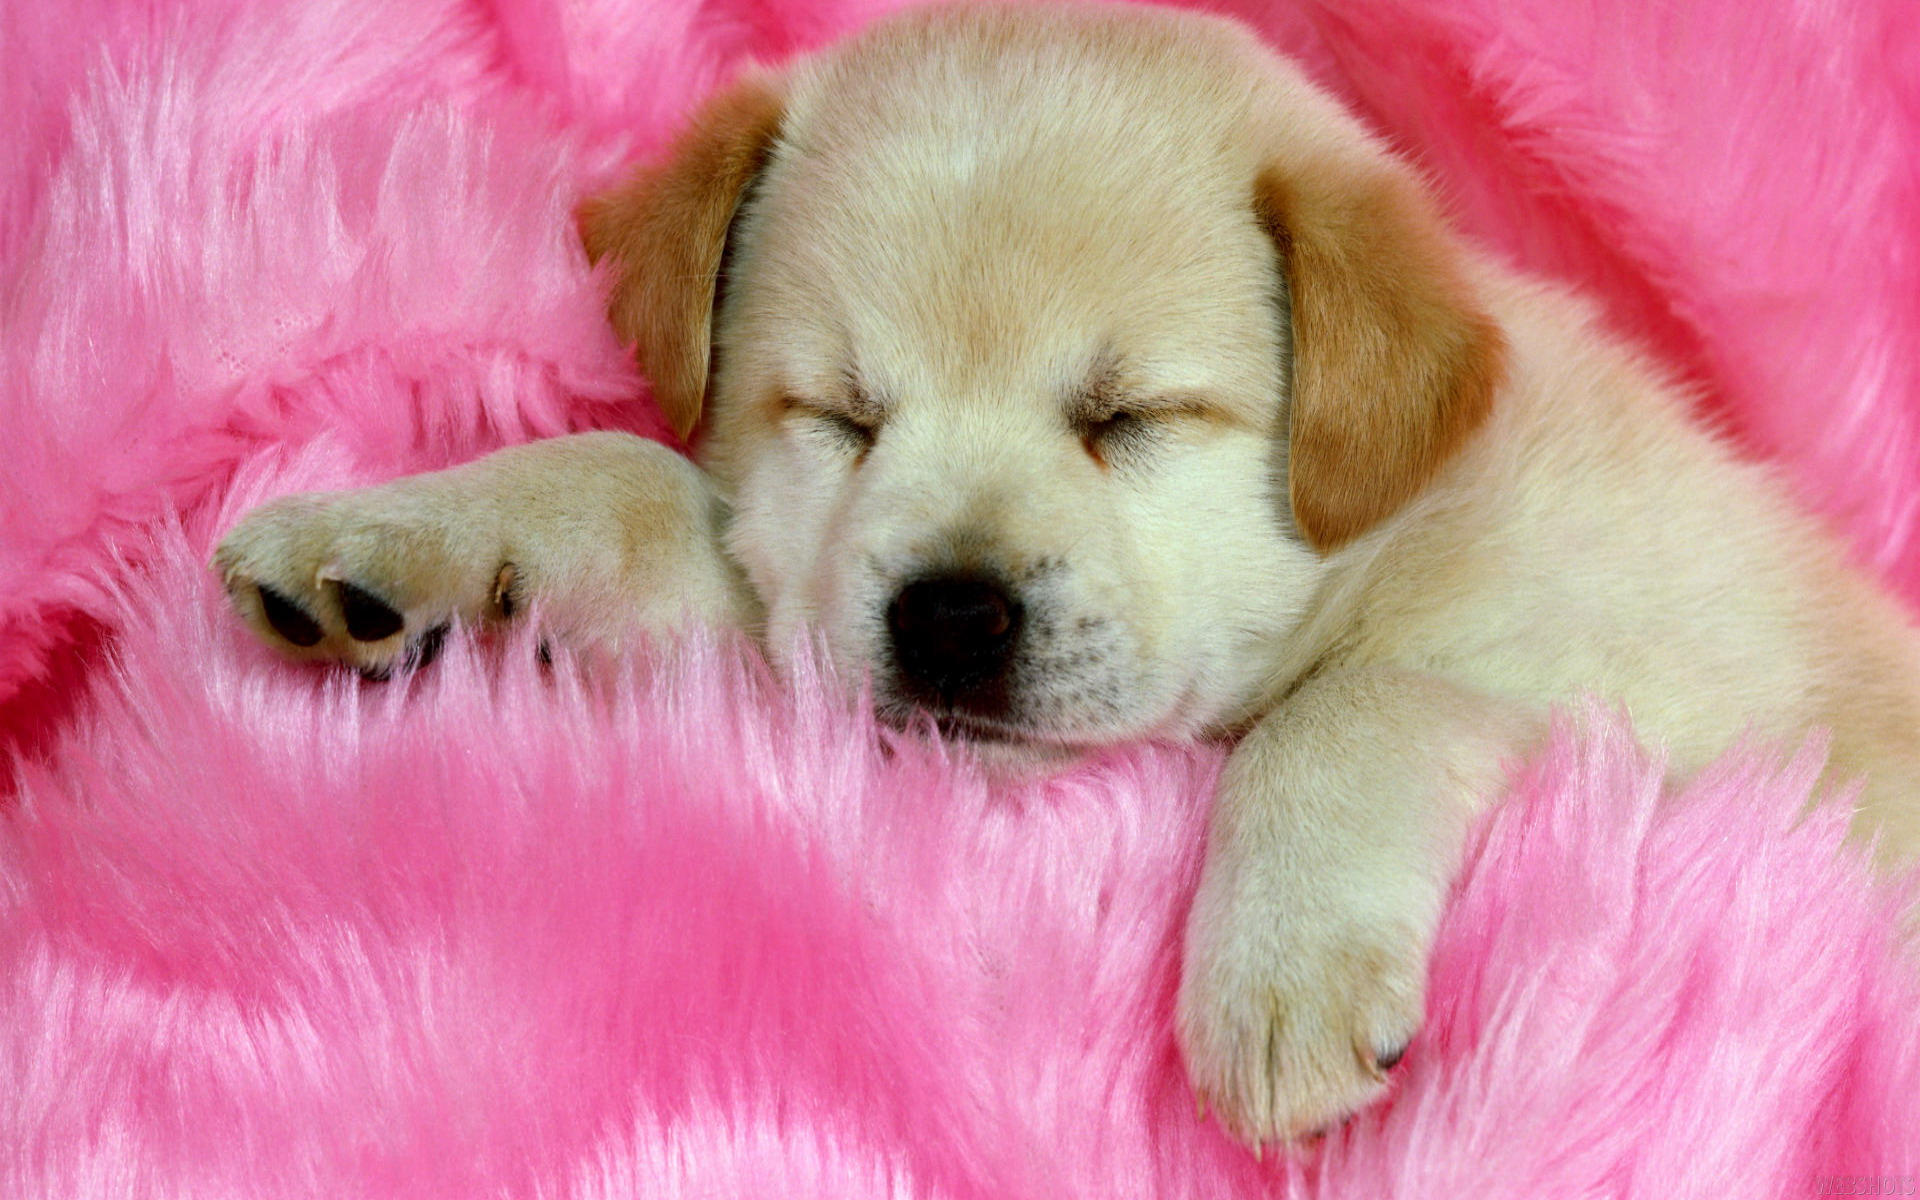 Cute Dog wallpaper   142694 1920x1200